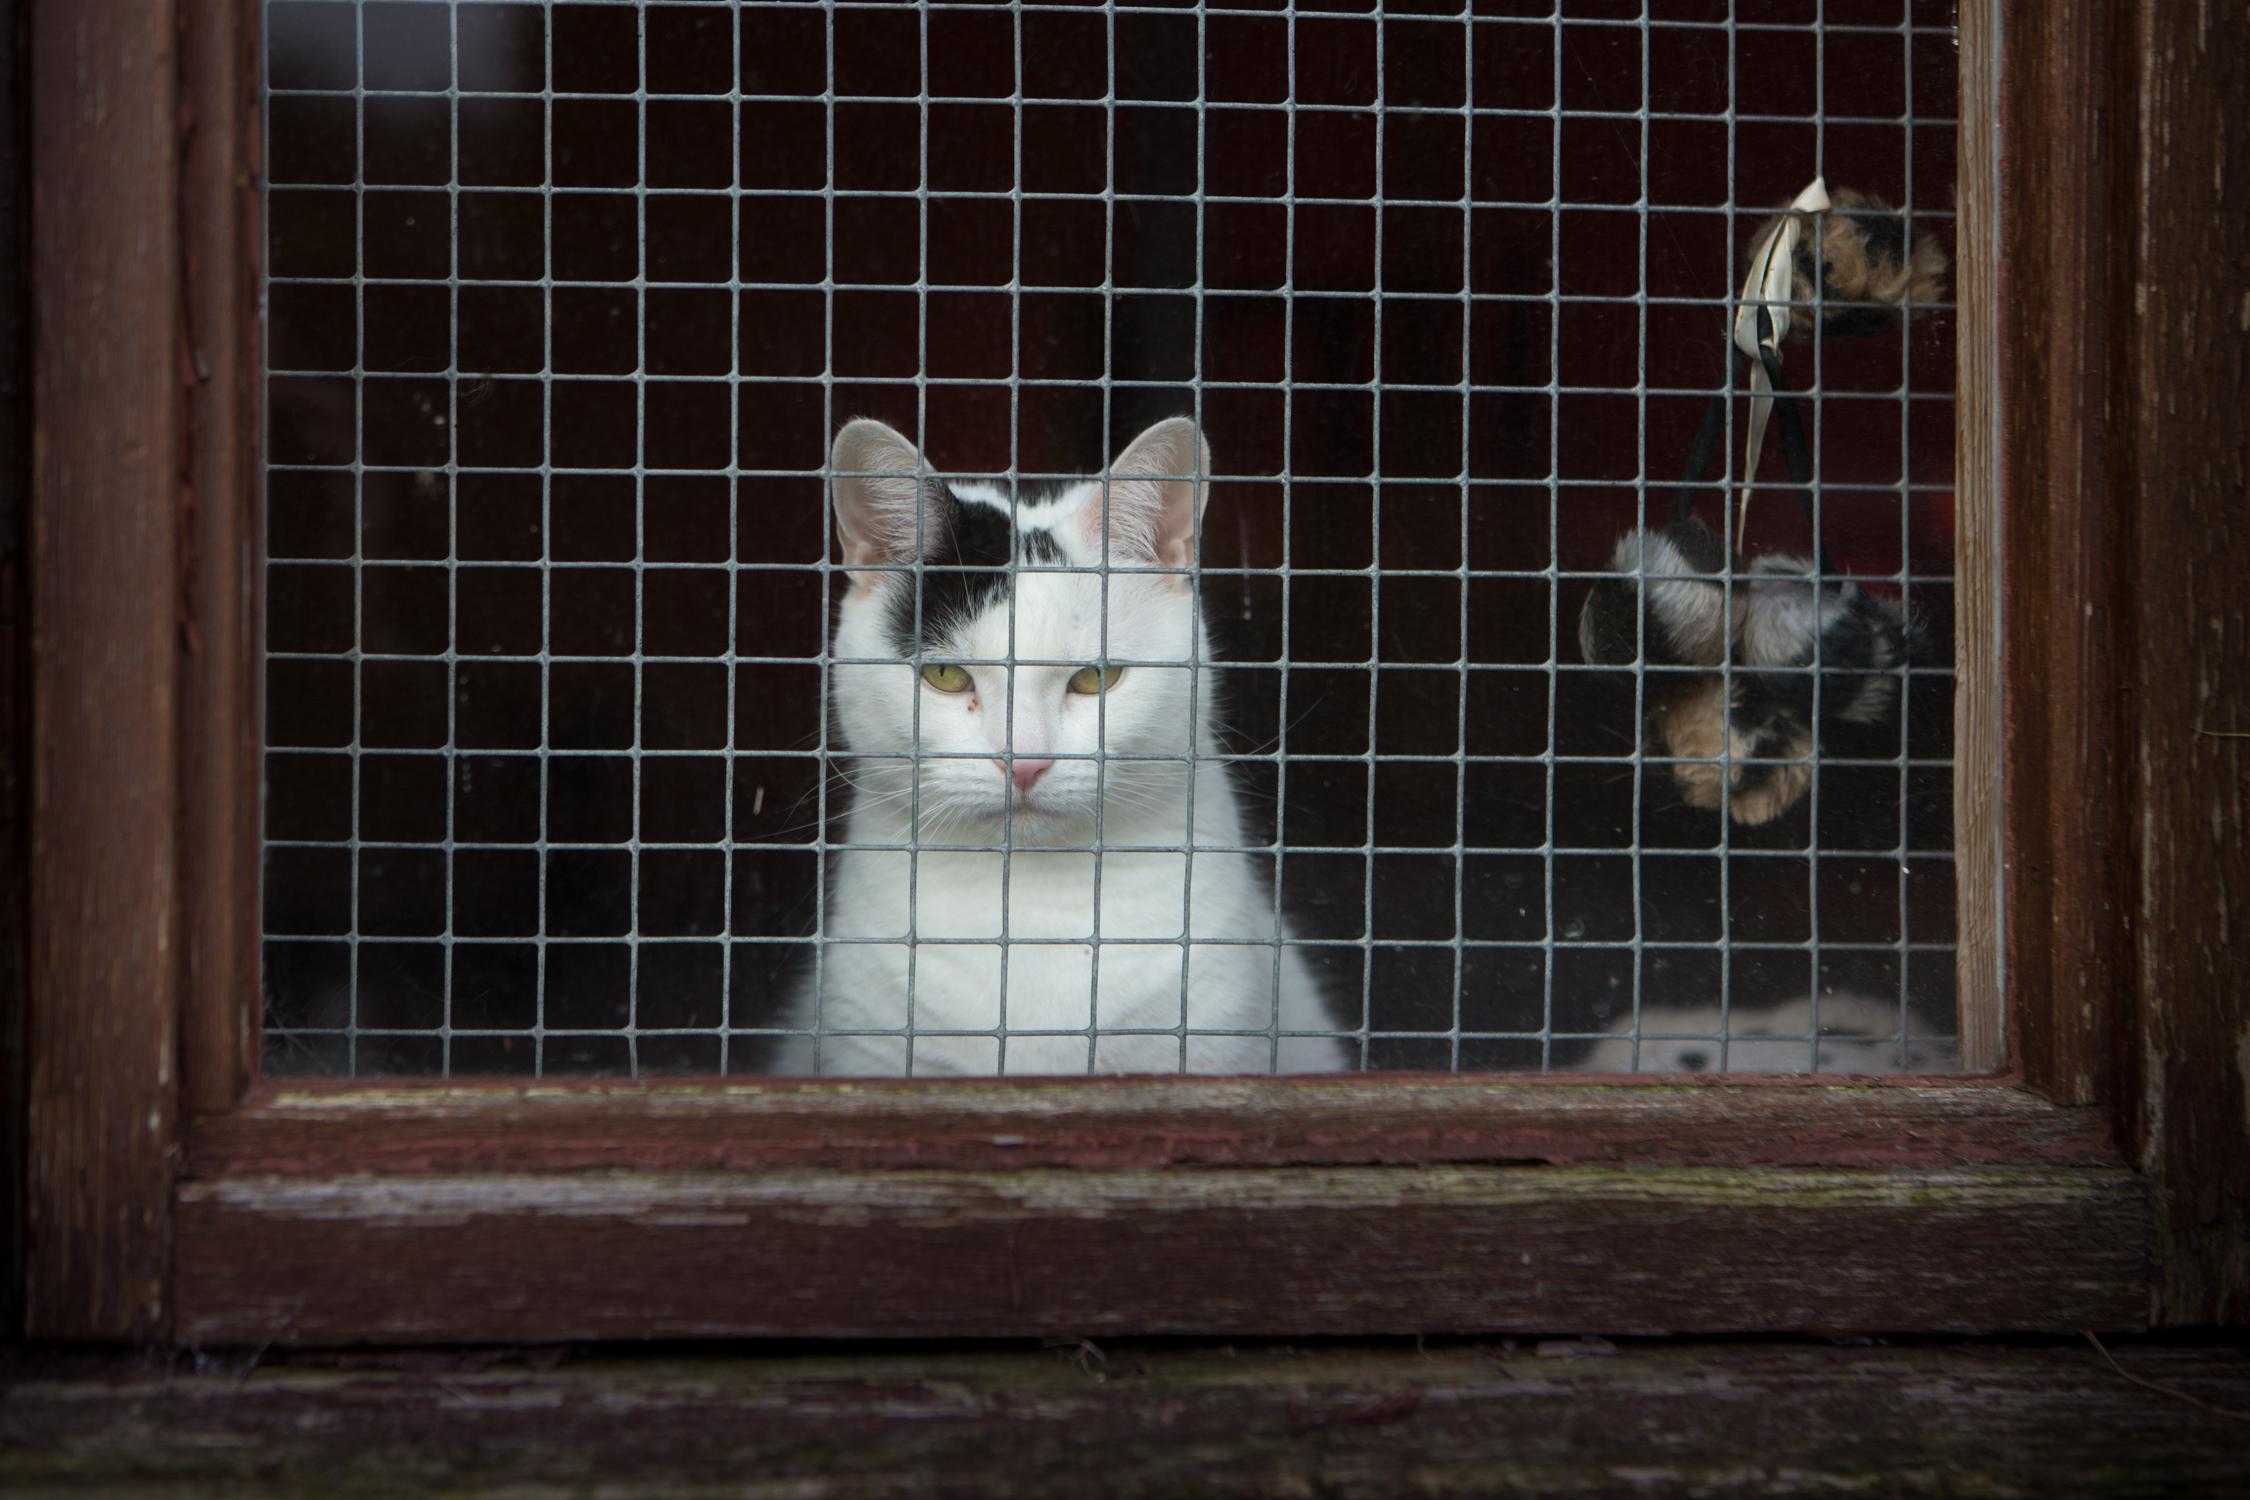 KW_Cats1_027.jpg